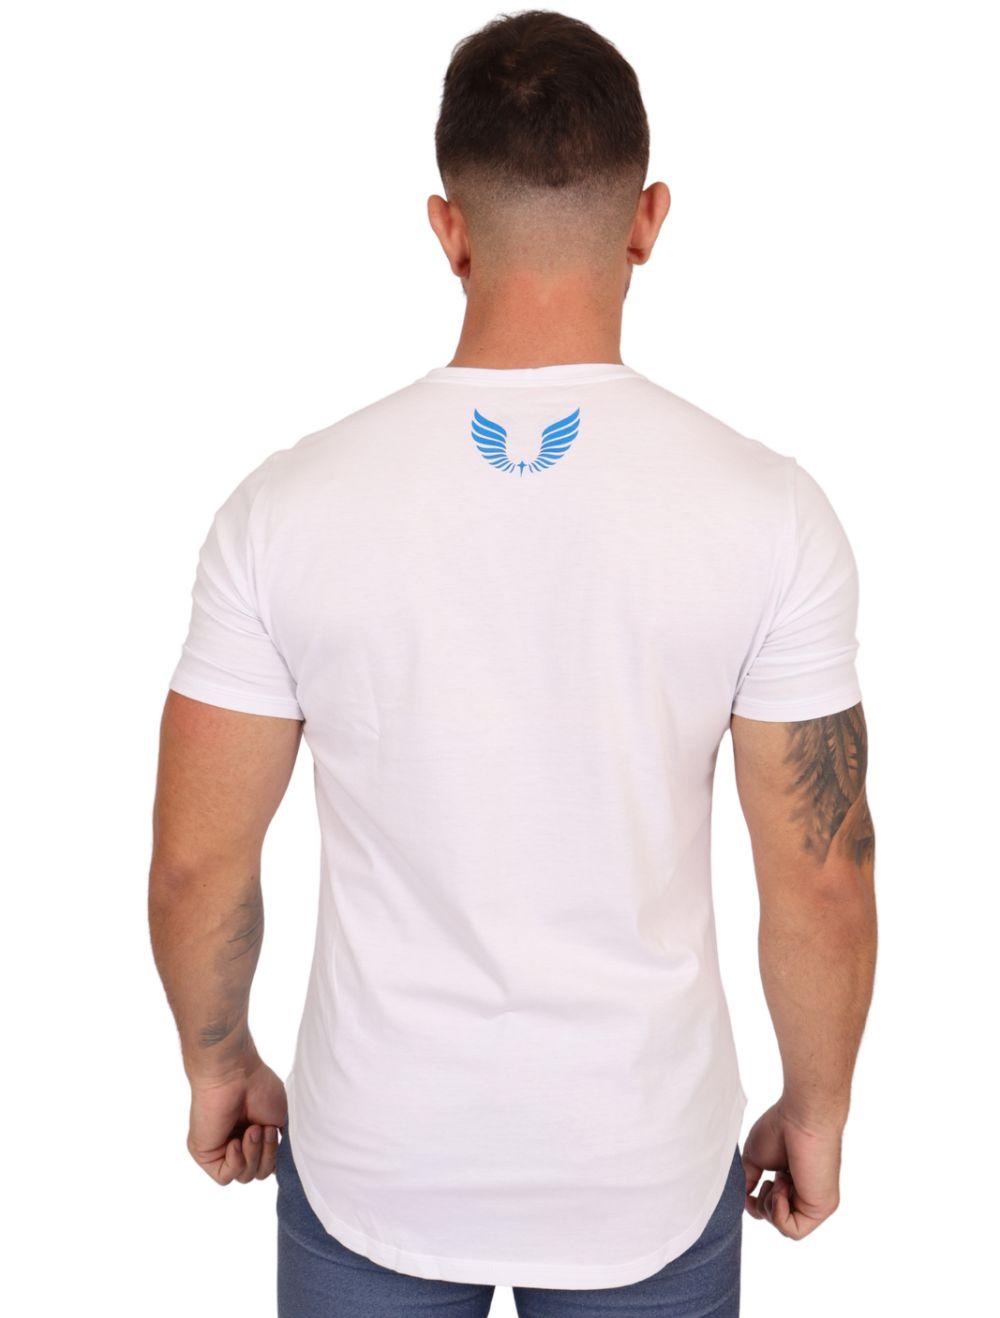 Camiseta Masculina Estampada Longline Manga Curta Branca